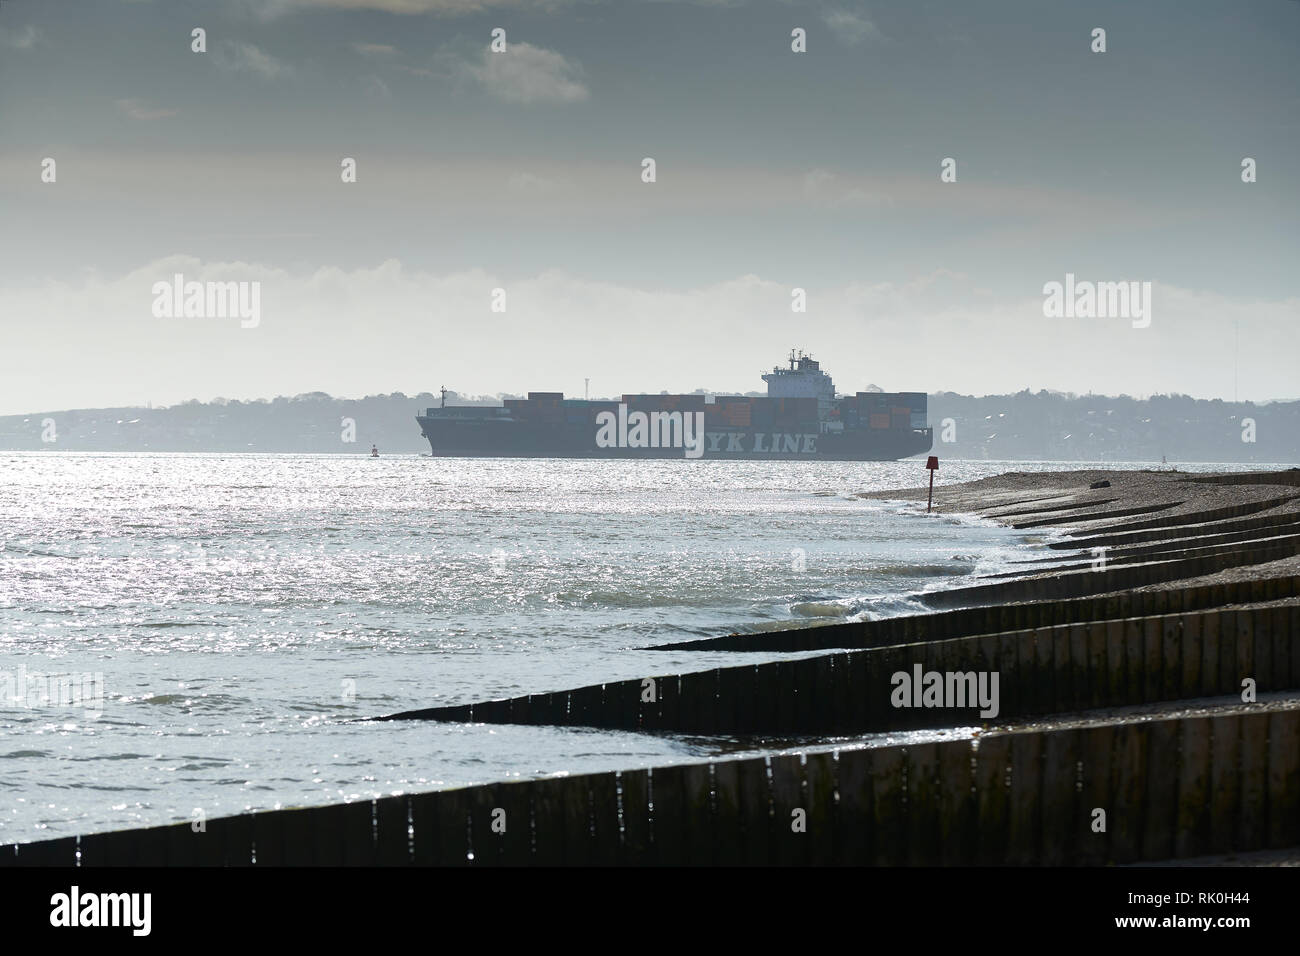 NYK LINE Container Ship, NYK NEBULA, Approaching The Port Of Southampton, United Kingdom, 7 February 2019. - Stock Image